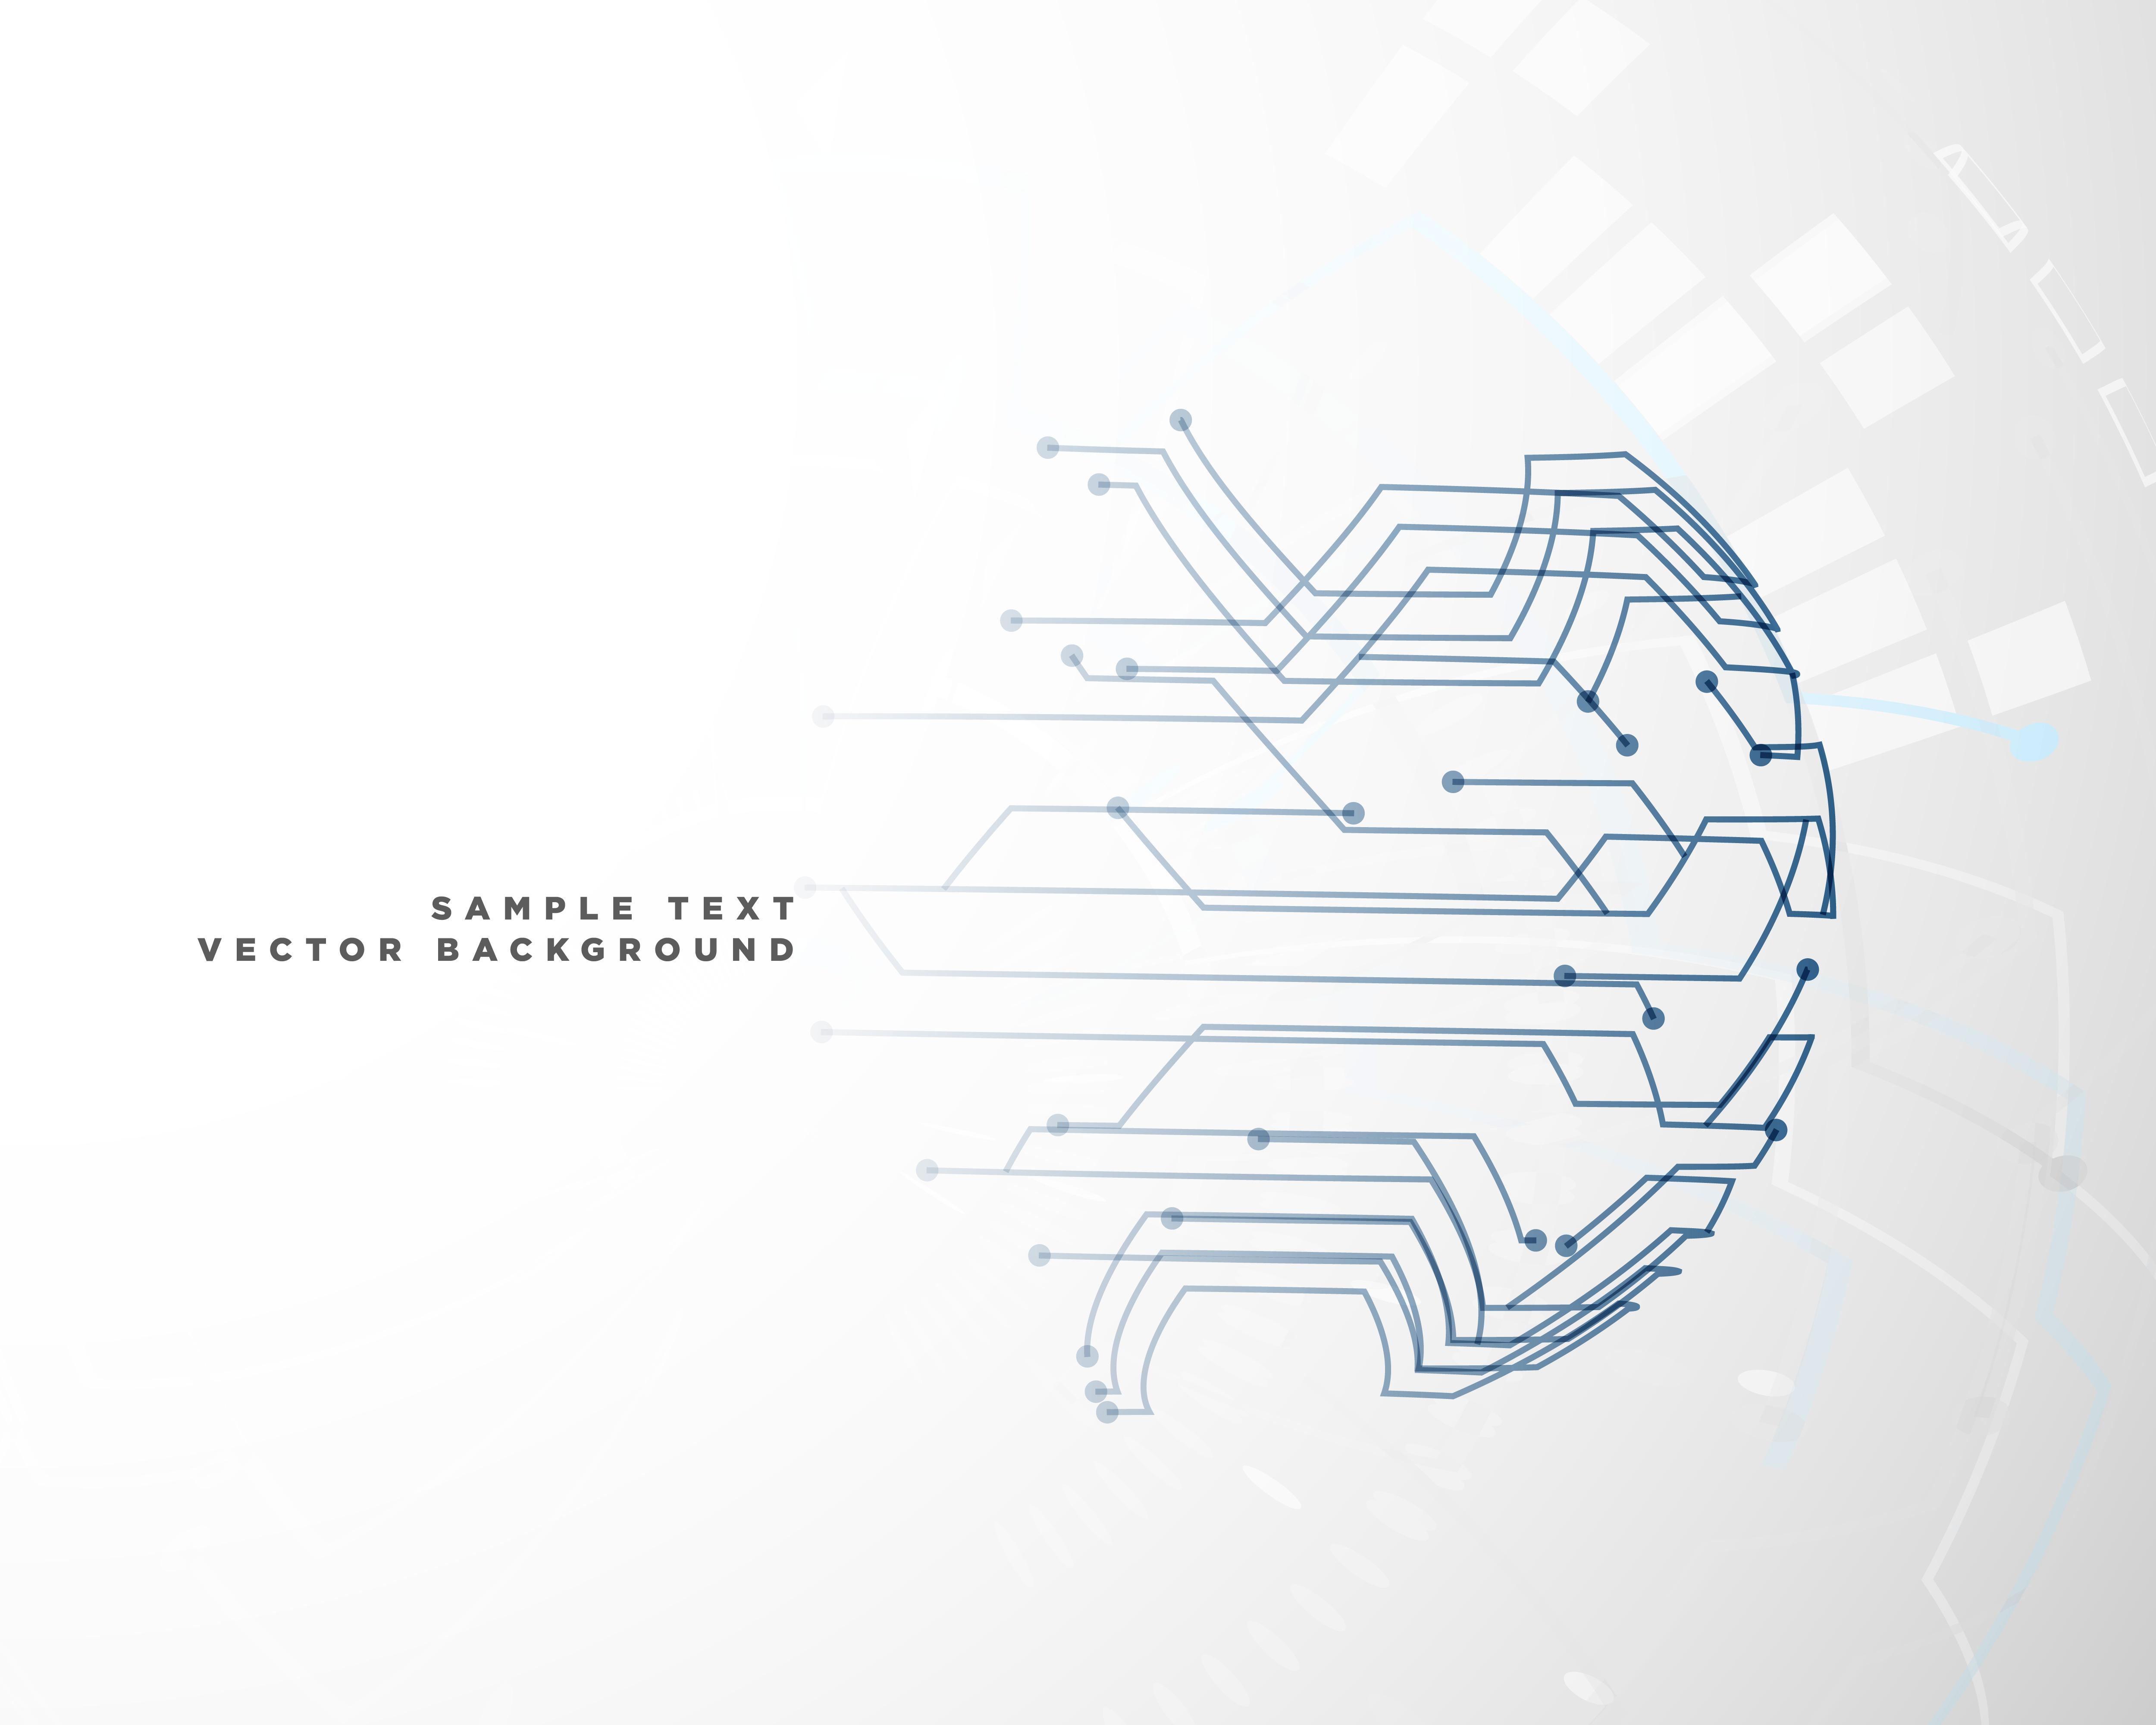 Digital Circuit Wire Mesh Background Download Free Vector Art Belarus Wiring Schematic Stock Graphics Images